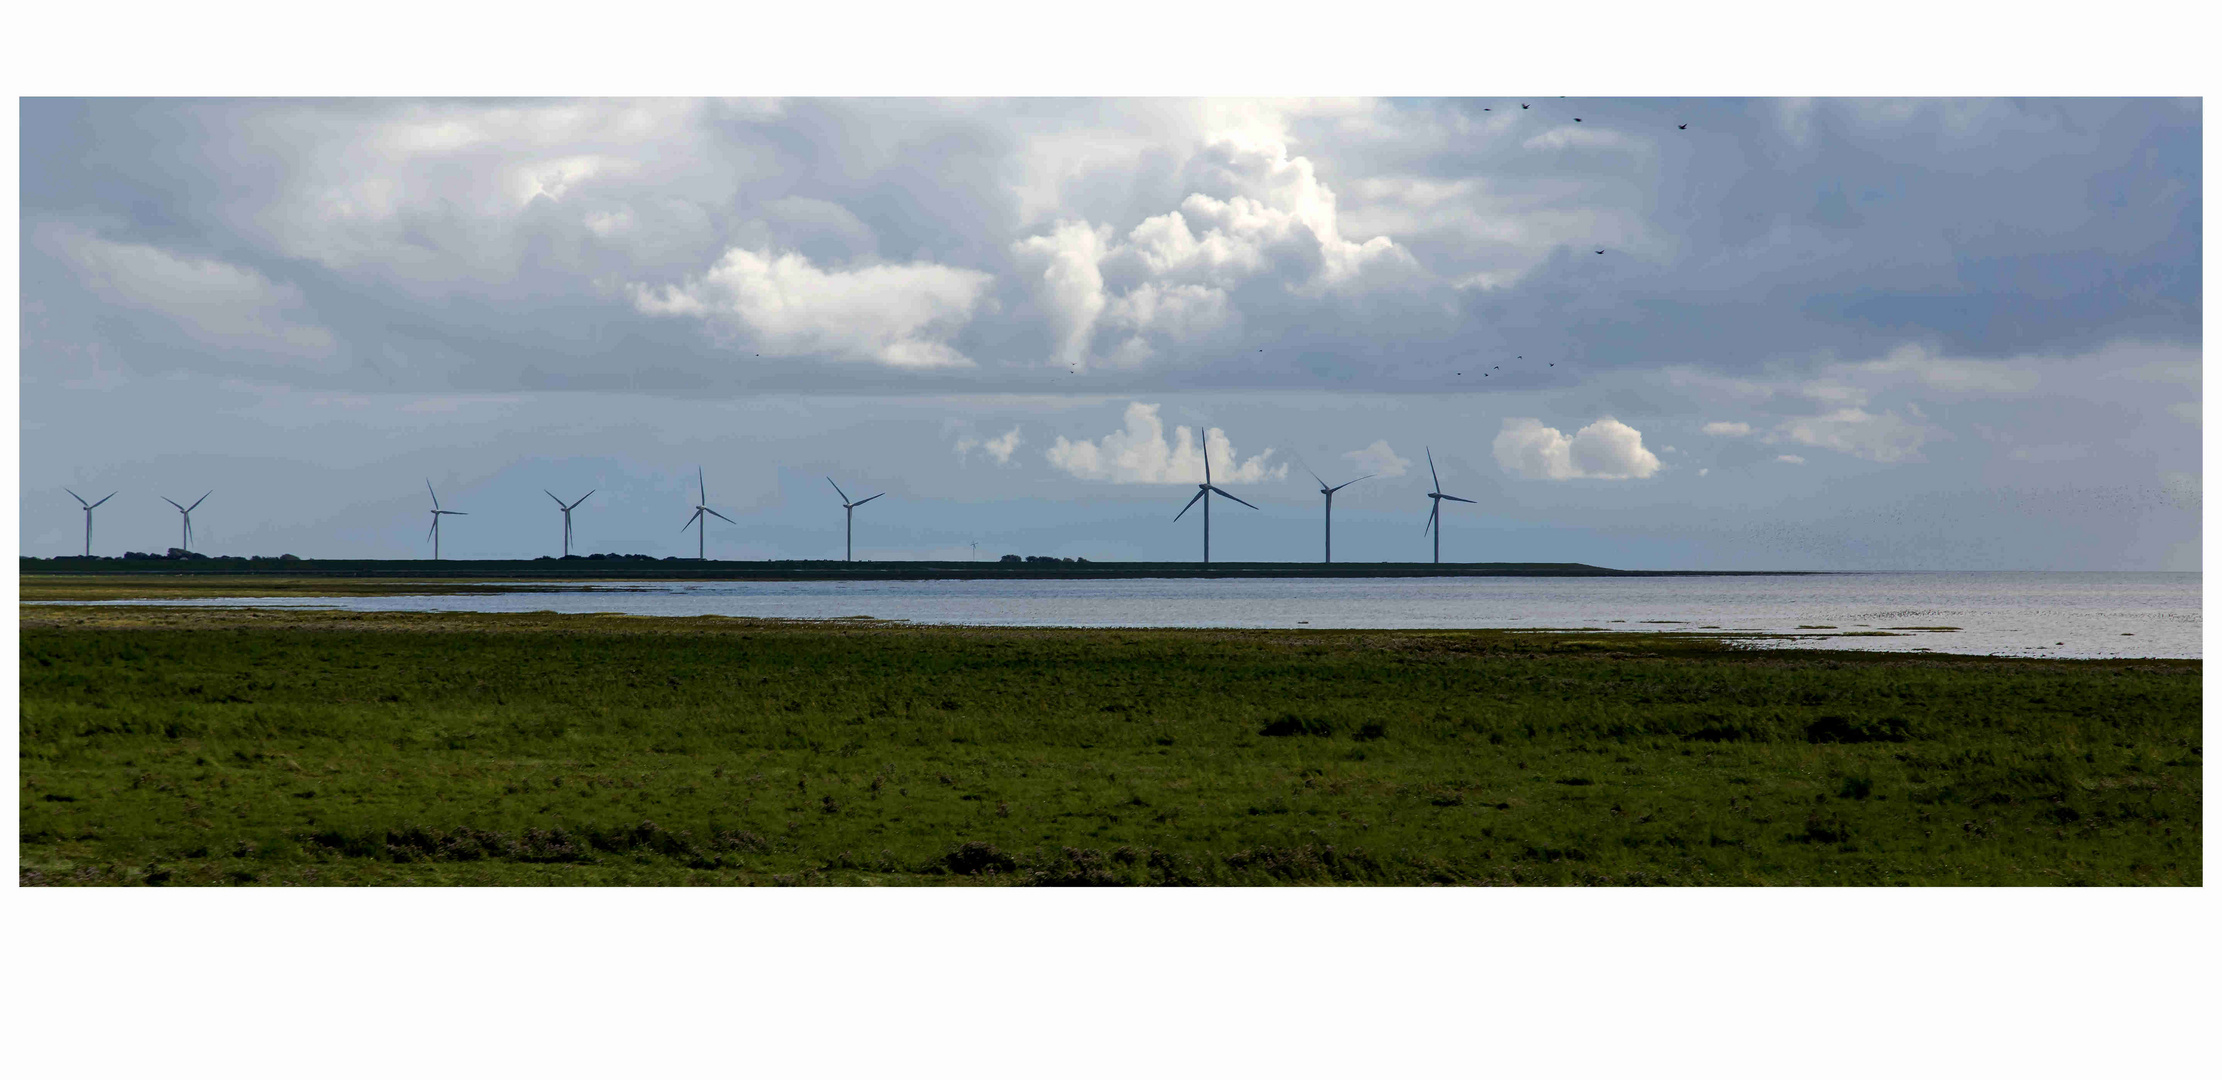 Sylt, - moderne Windmühlen am Horizont